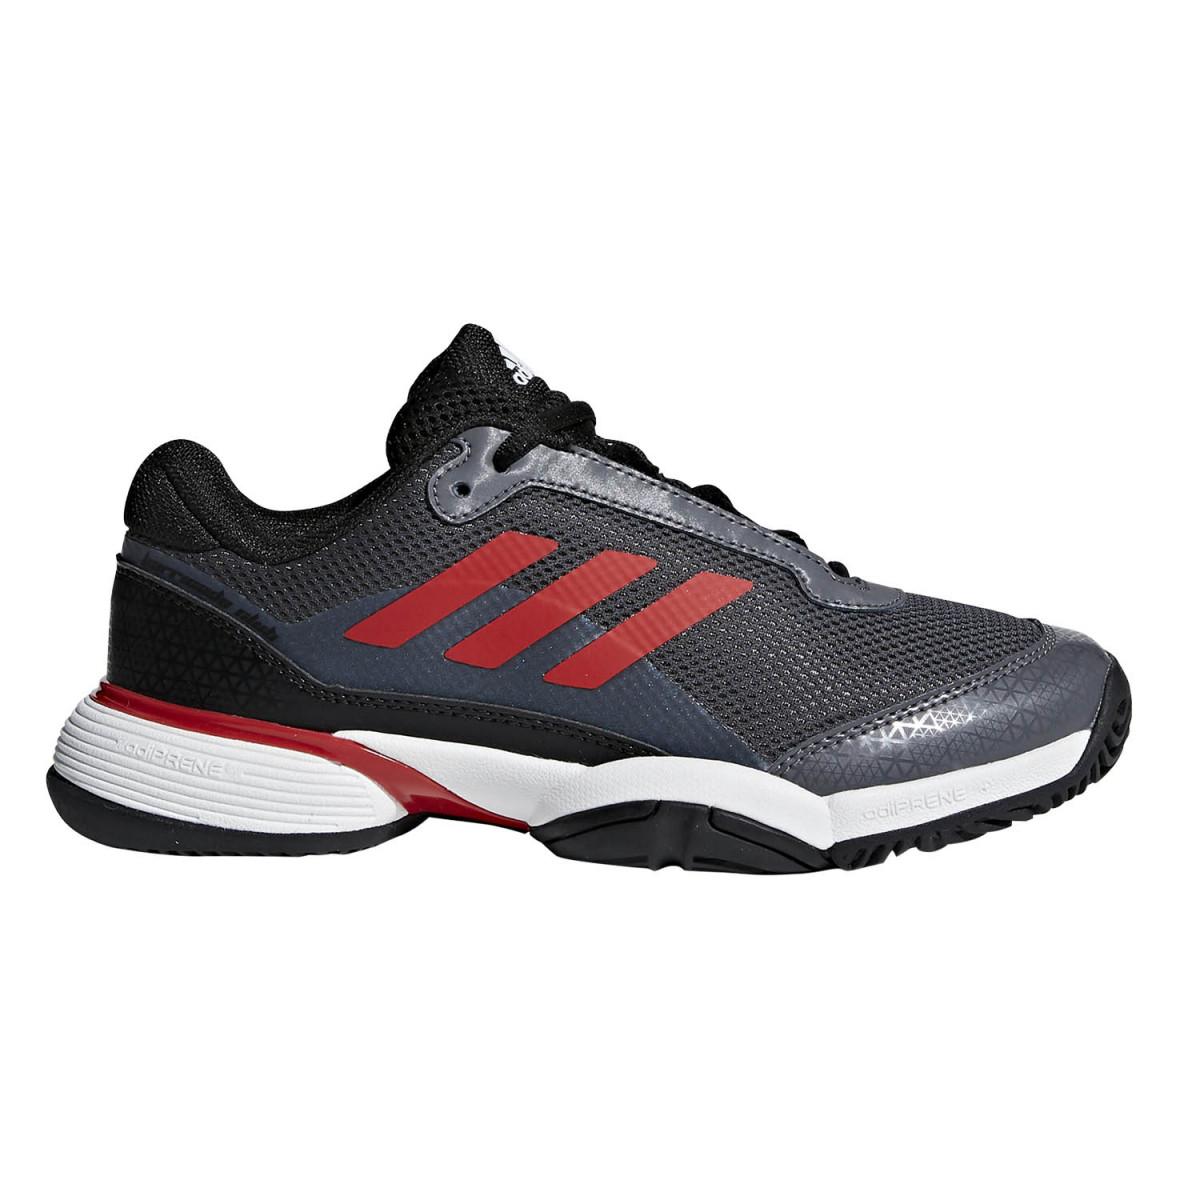 Zapatillas Adidas Barricade Club Xj